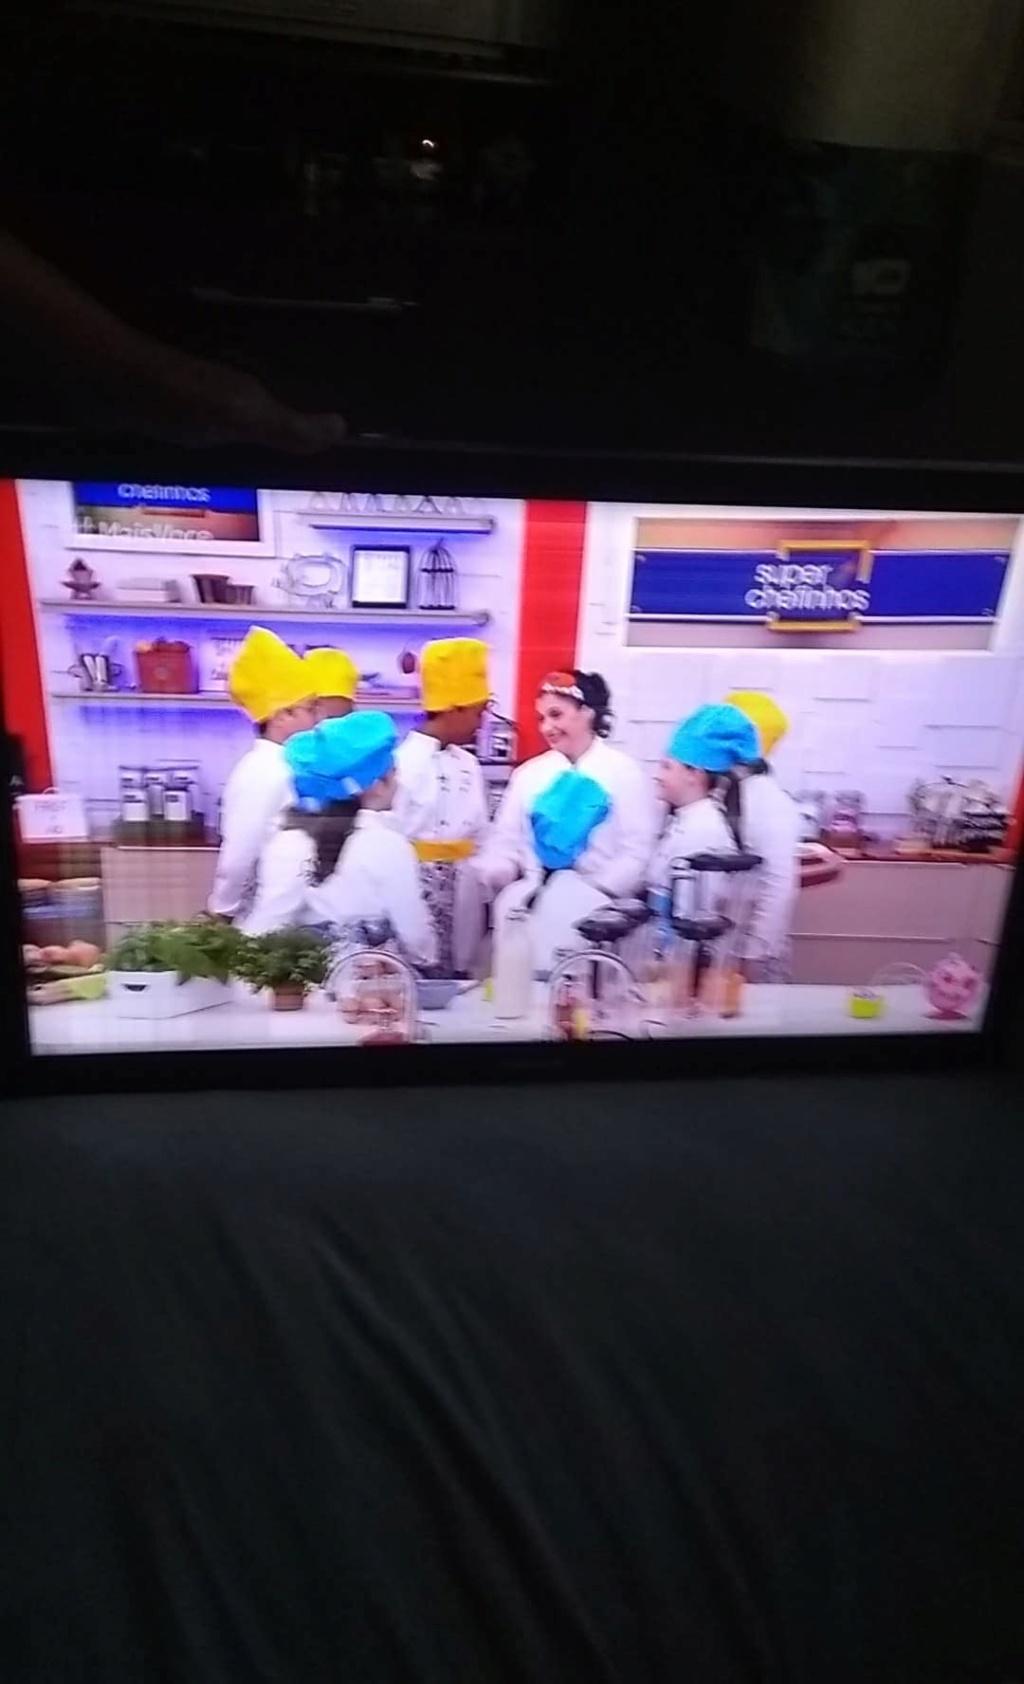 TV Samsung UN32D5000PG IMAGEM ESBRANQUIÇADA 43100311